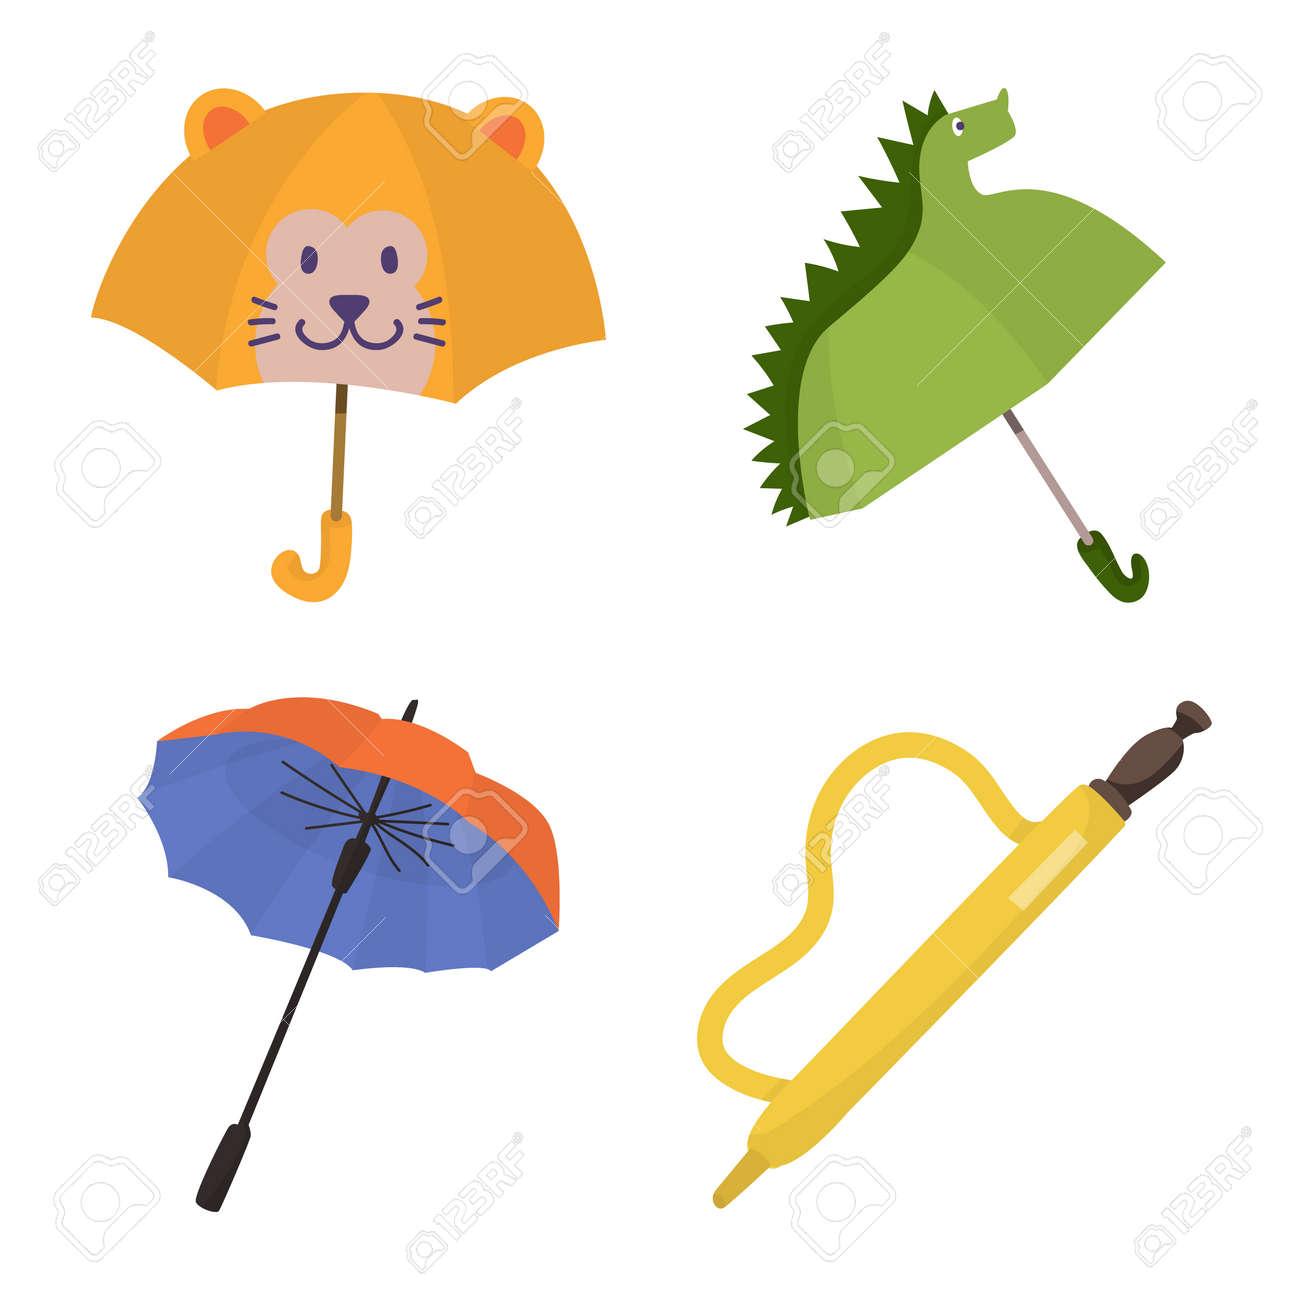 Vector illustration of umbrella and rain symbol. Set of umbrella and weather stock vector illustration. - 143496079